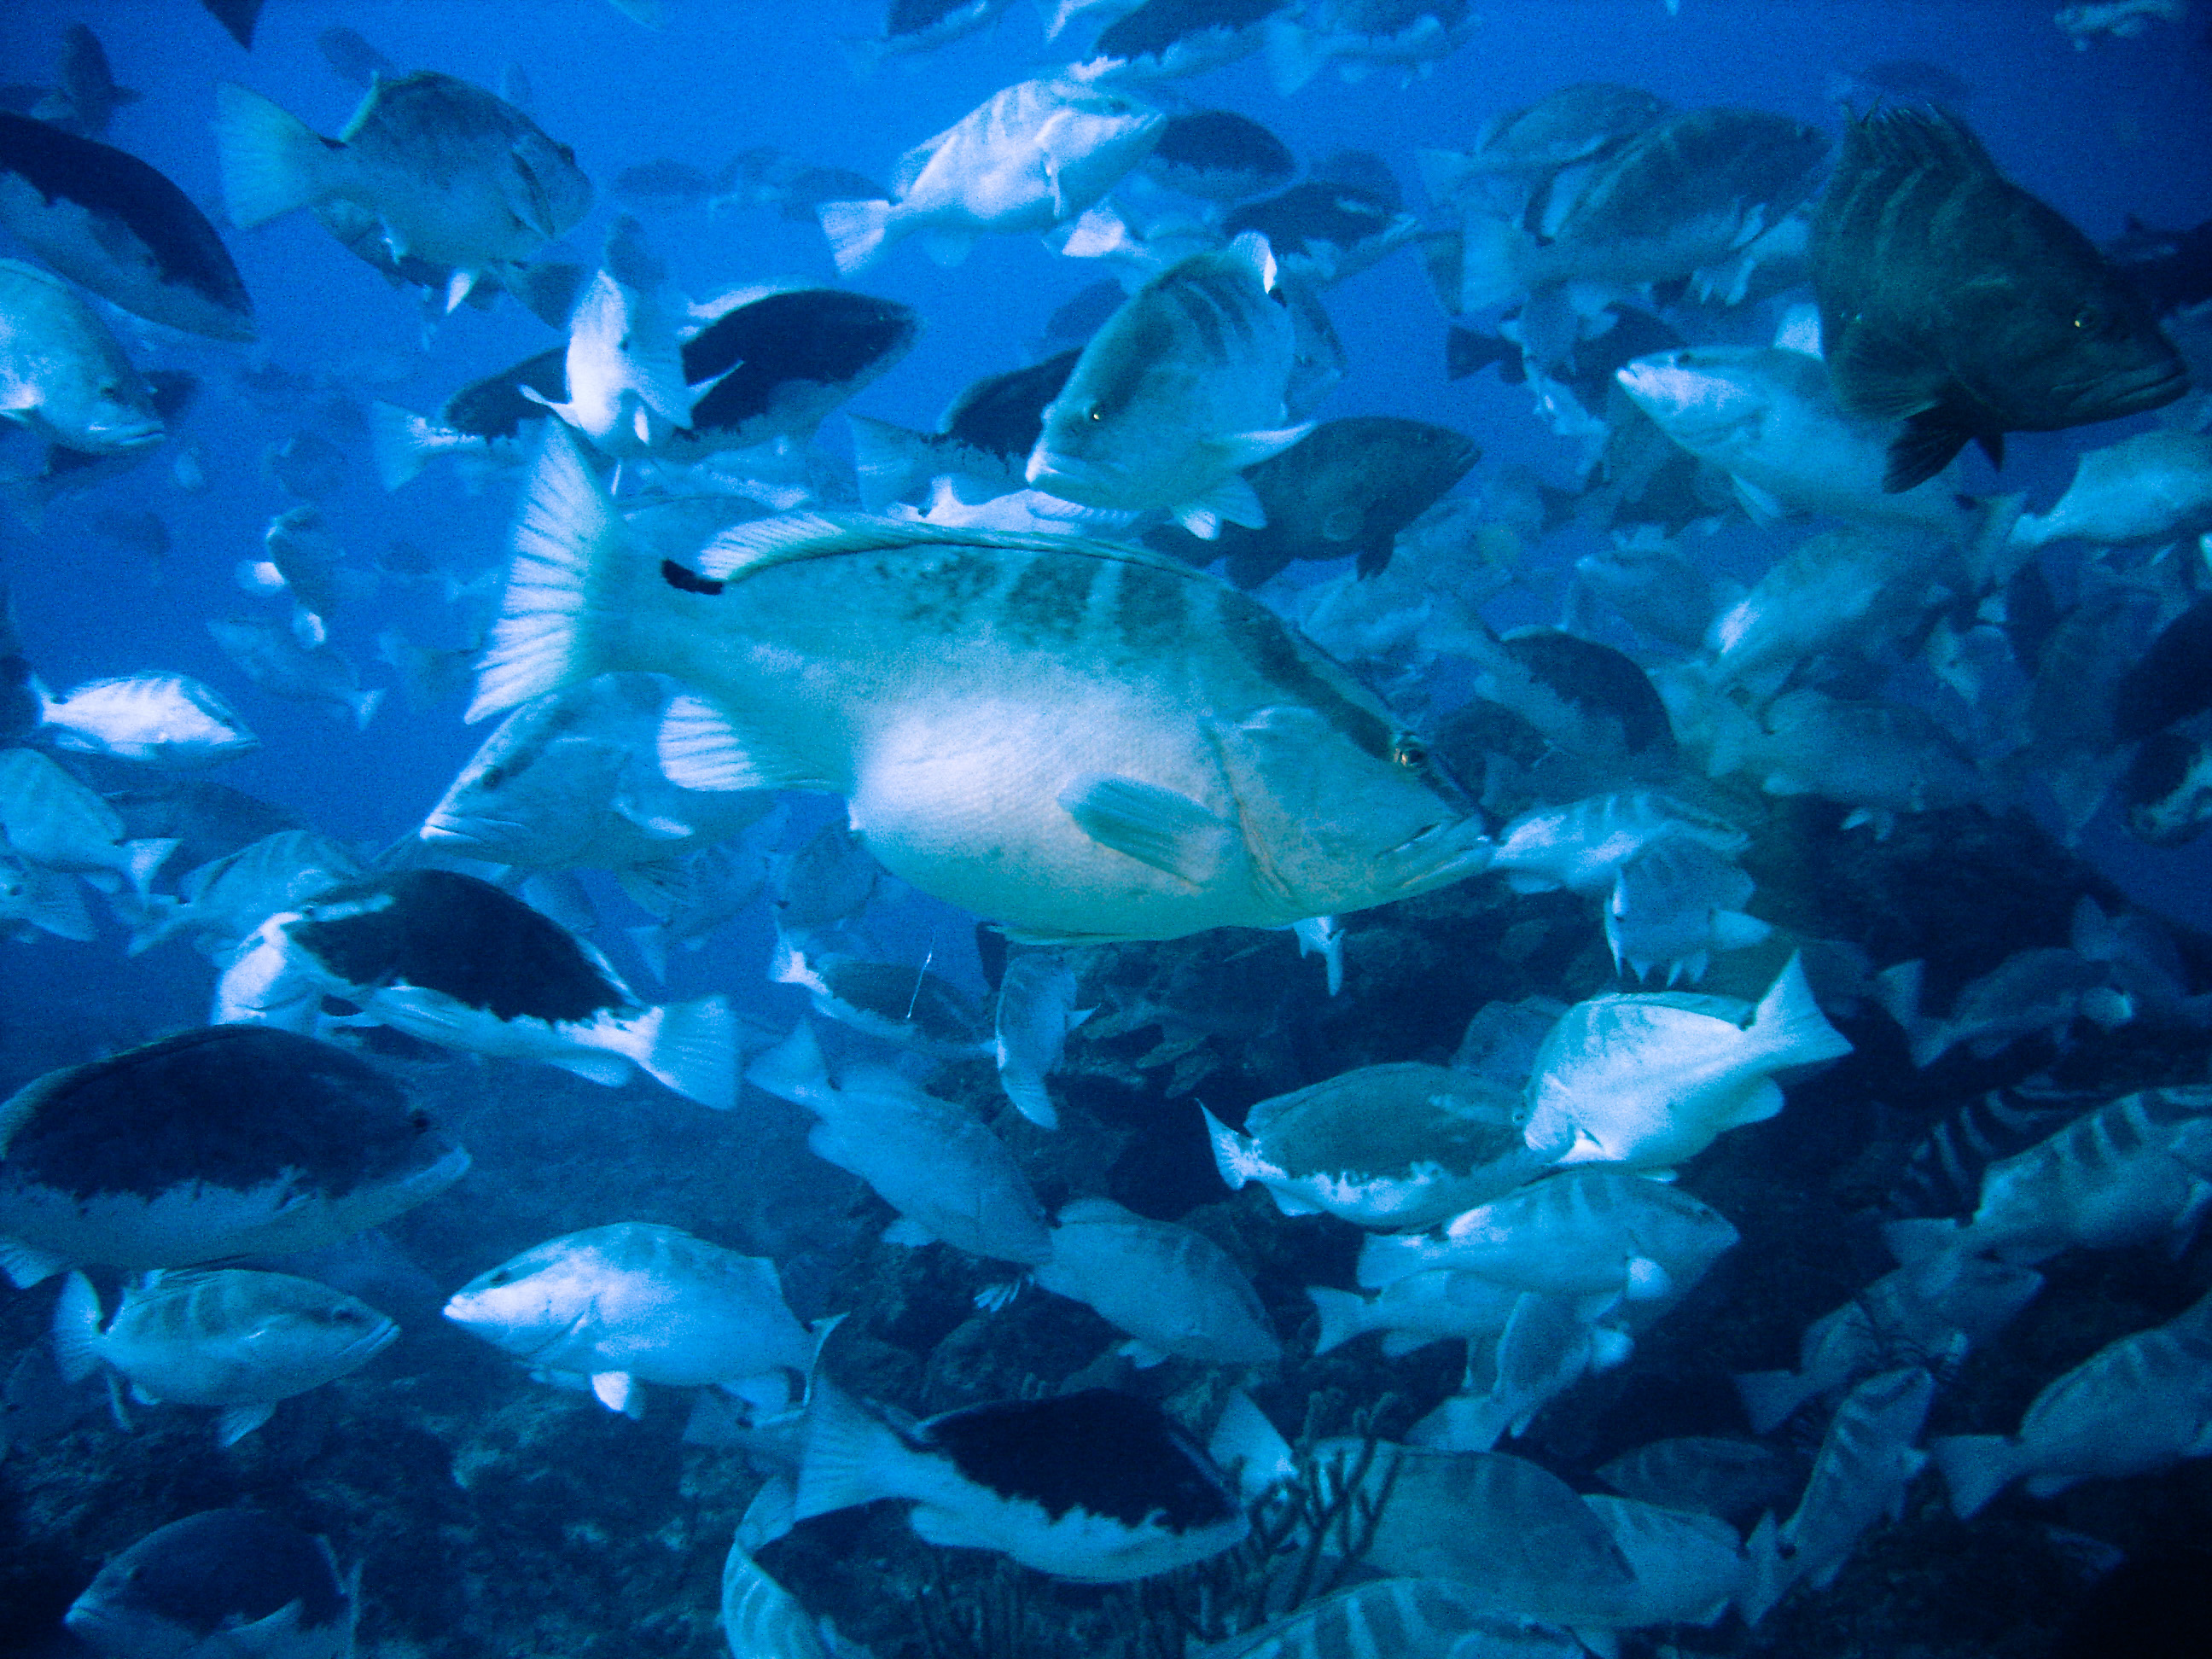 the nassau grouper Marine life of the bahamas scientific name nassau grouper epinephelus striatus description the nassau grouper belongs to the seabass family of fi sh all seabass have strong, stout.